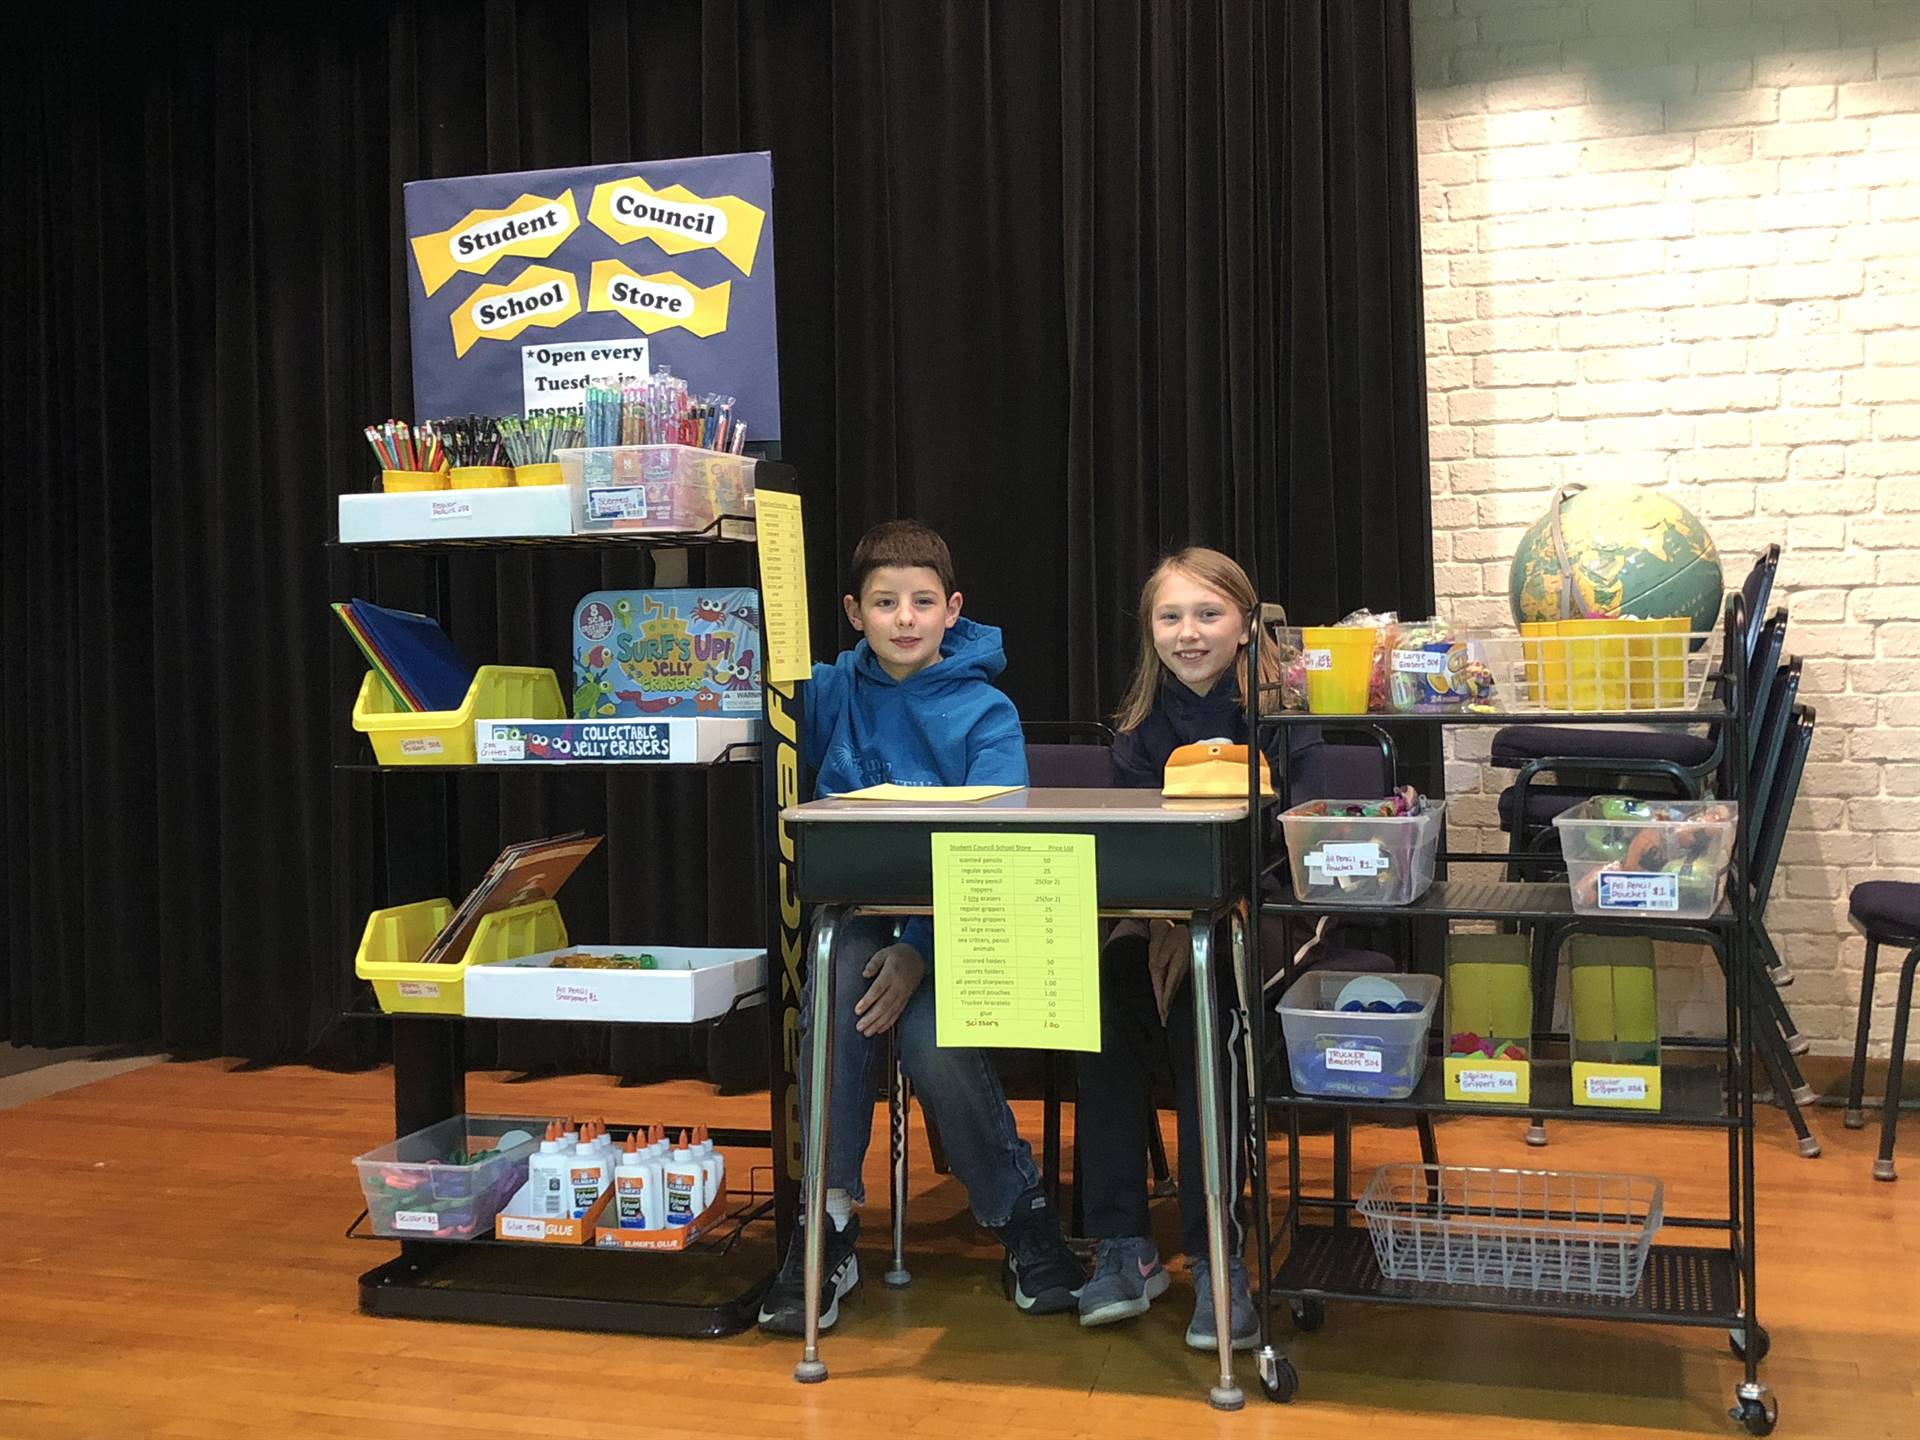 League school supply store